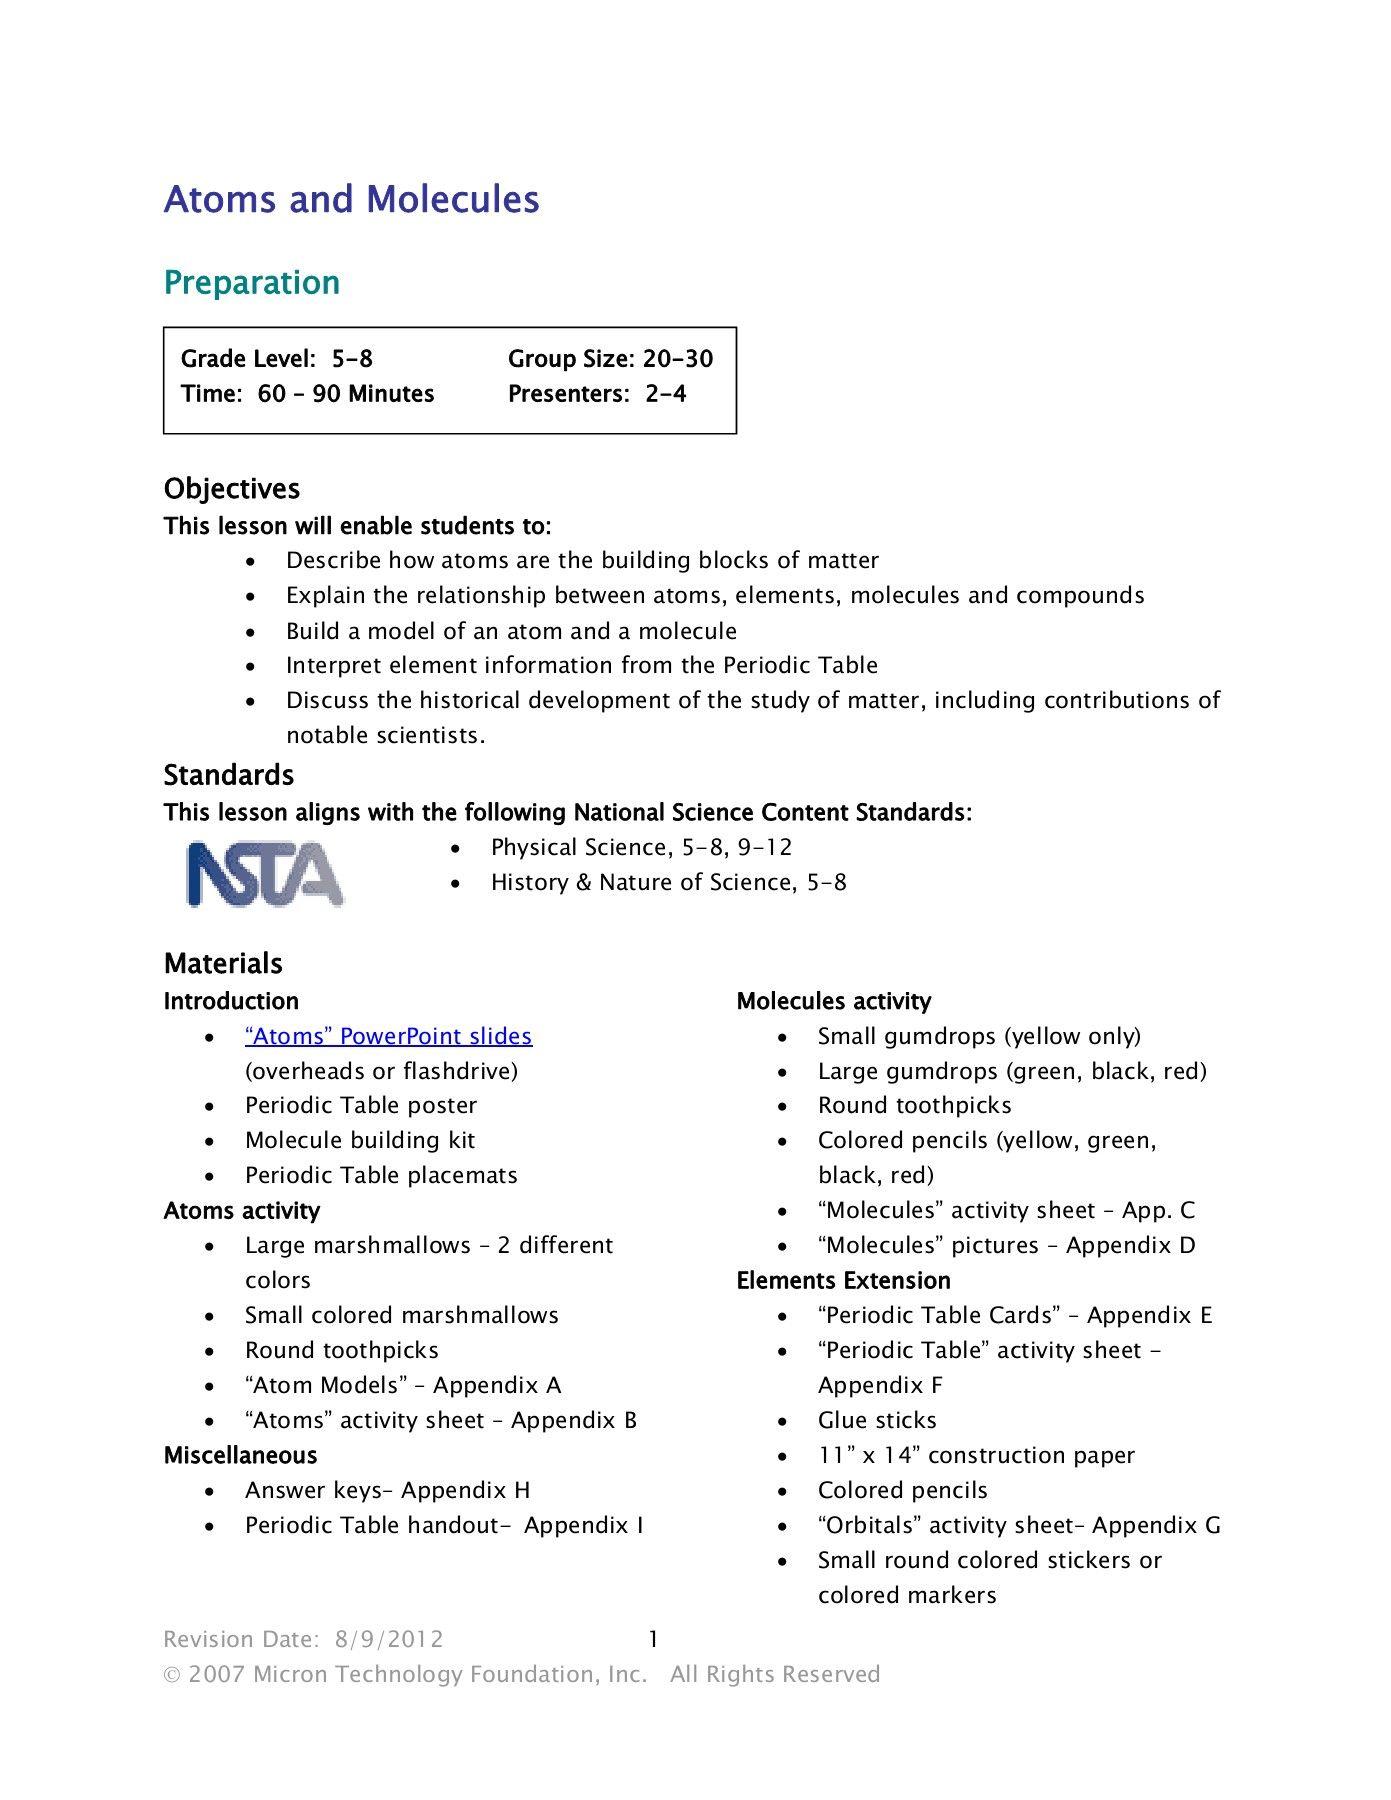 Electron Configuration Worksheet Year 9